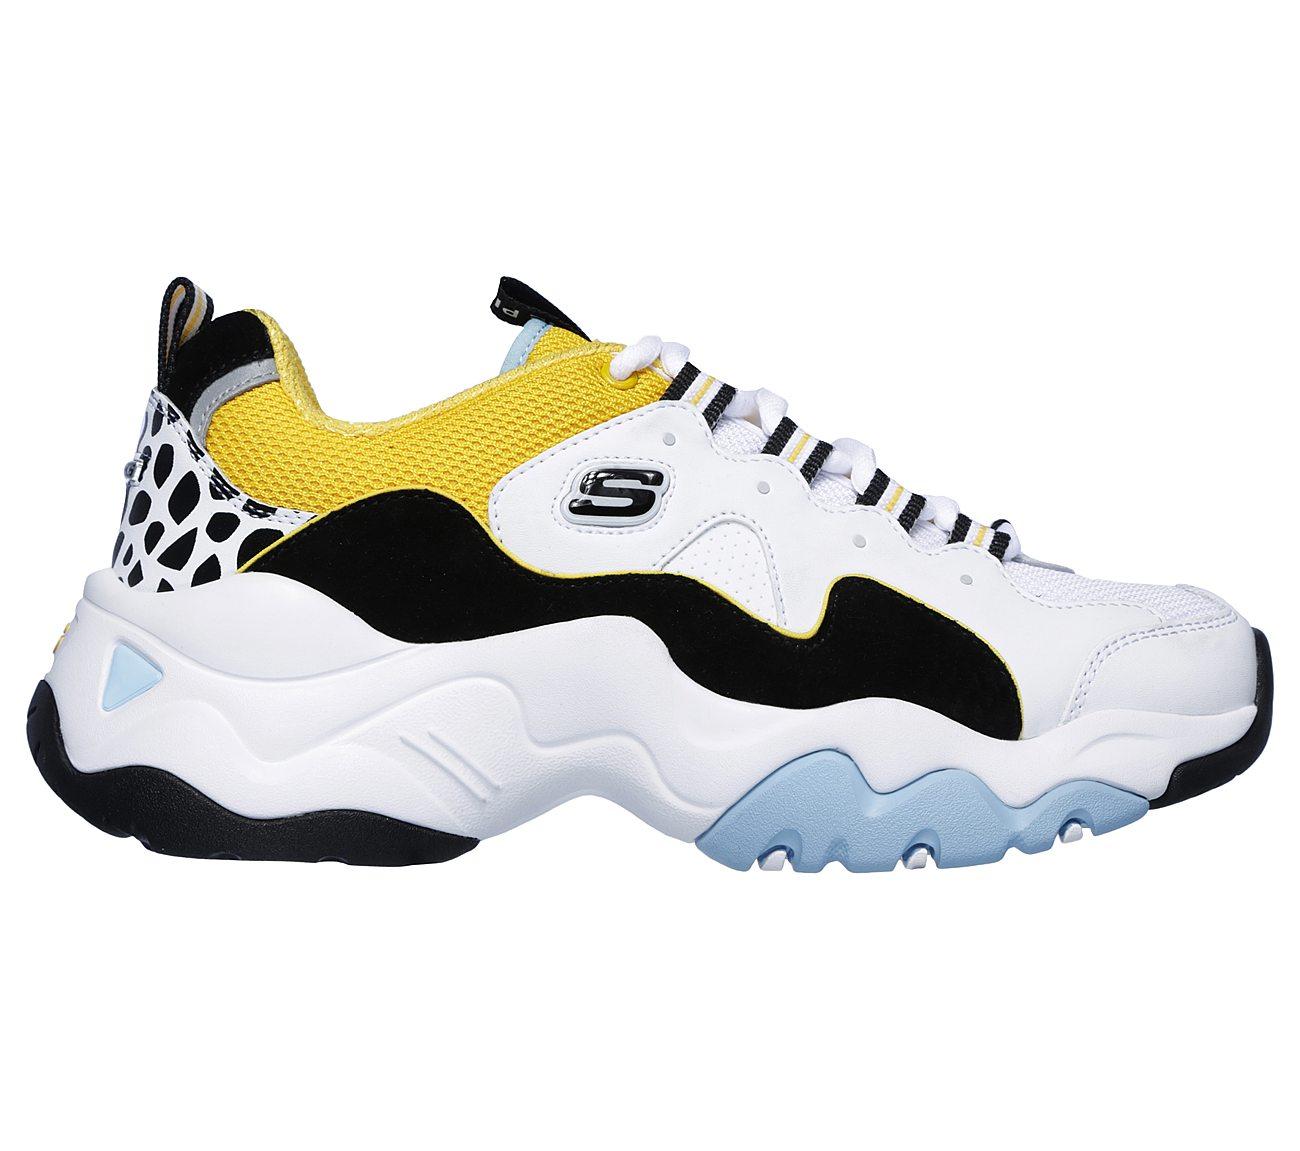 e9dd44c9 Buy SKECHERS D'Lites 3 - One Piece V.2 Sport Shoes only $65.00